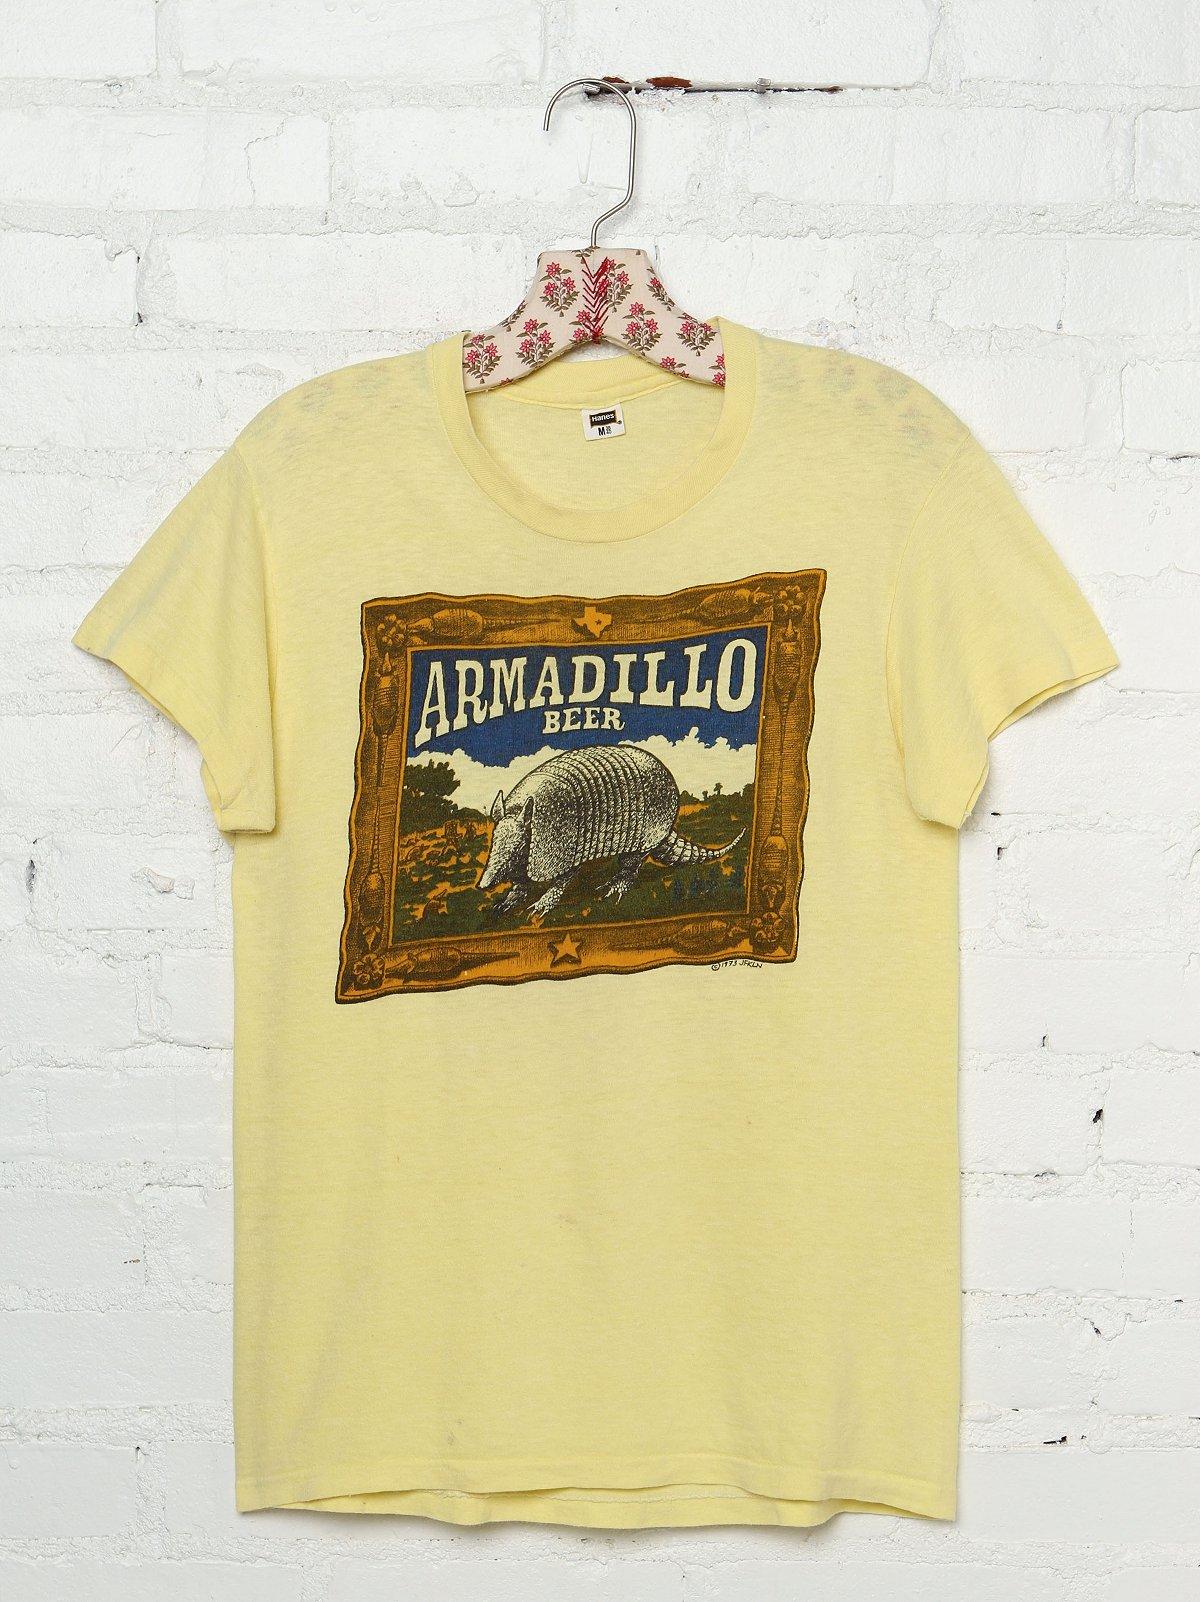 Vintage Armadillo Beer Graphic Tee